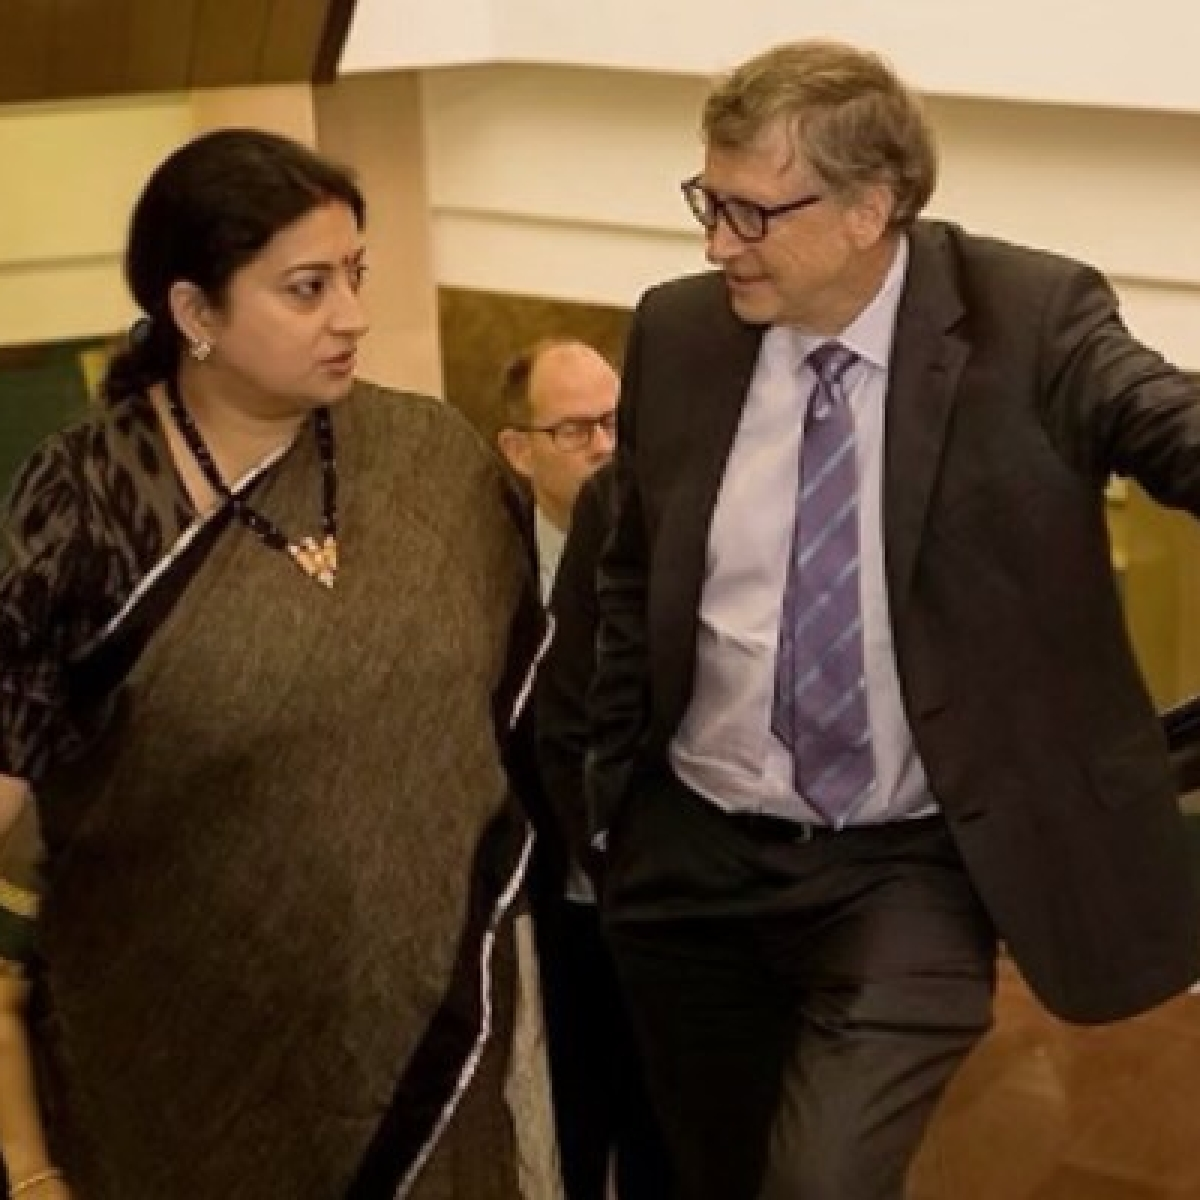 Smriti Irani cracks hilarious dropout joke next to Bill Gates, even Ekta Kapoor can't keep calm